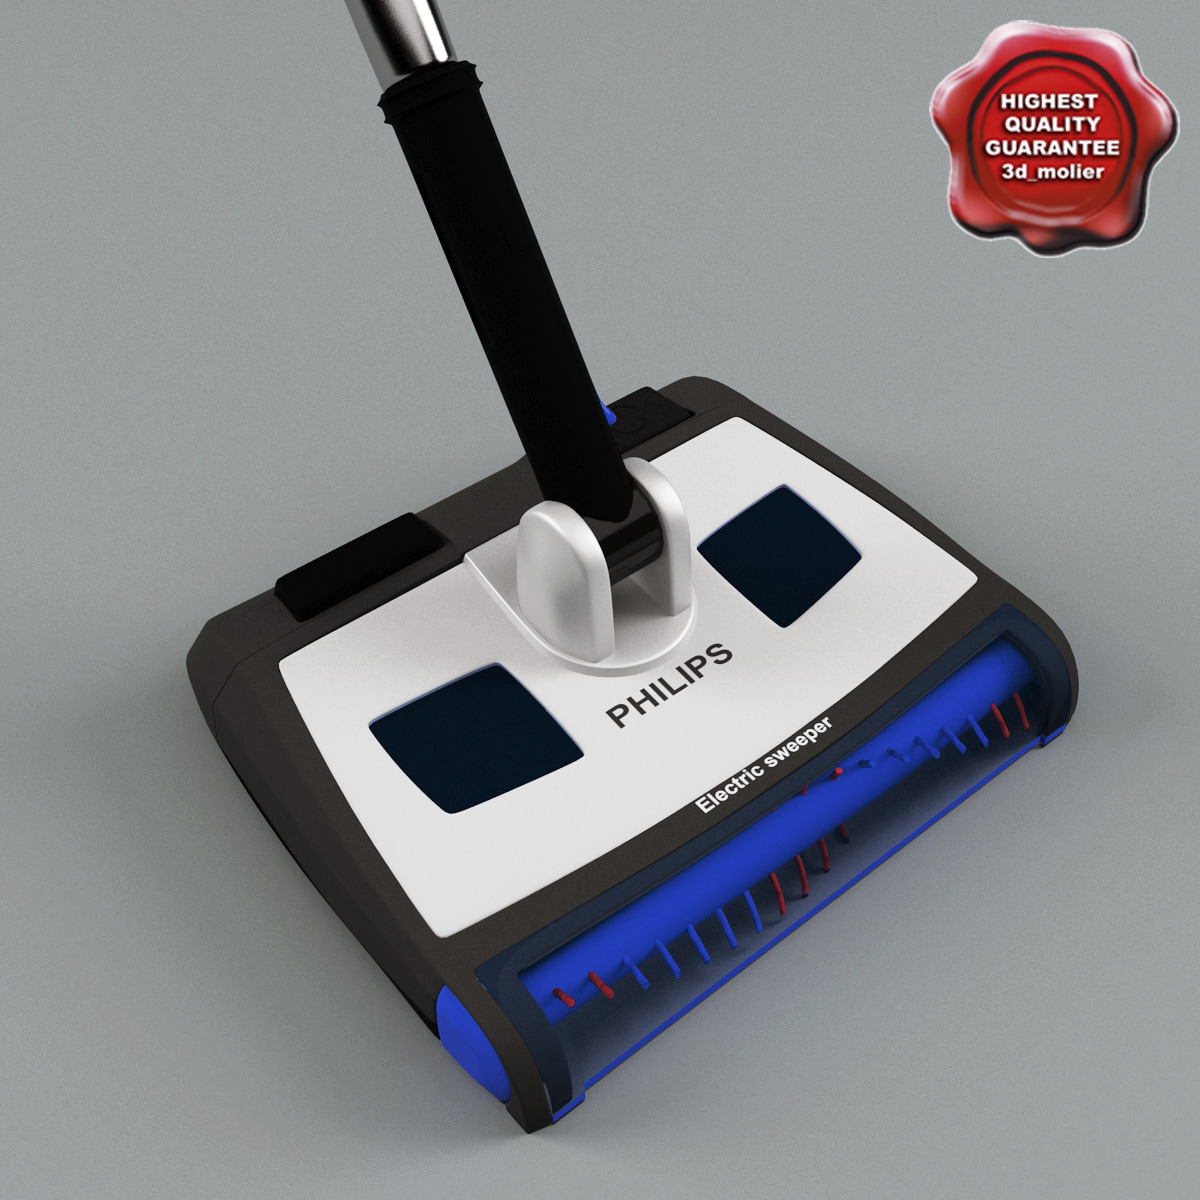 Electric_Sweeper_Philips_00.jpg